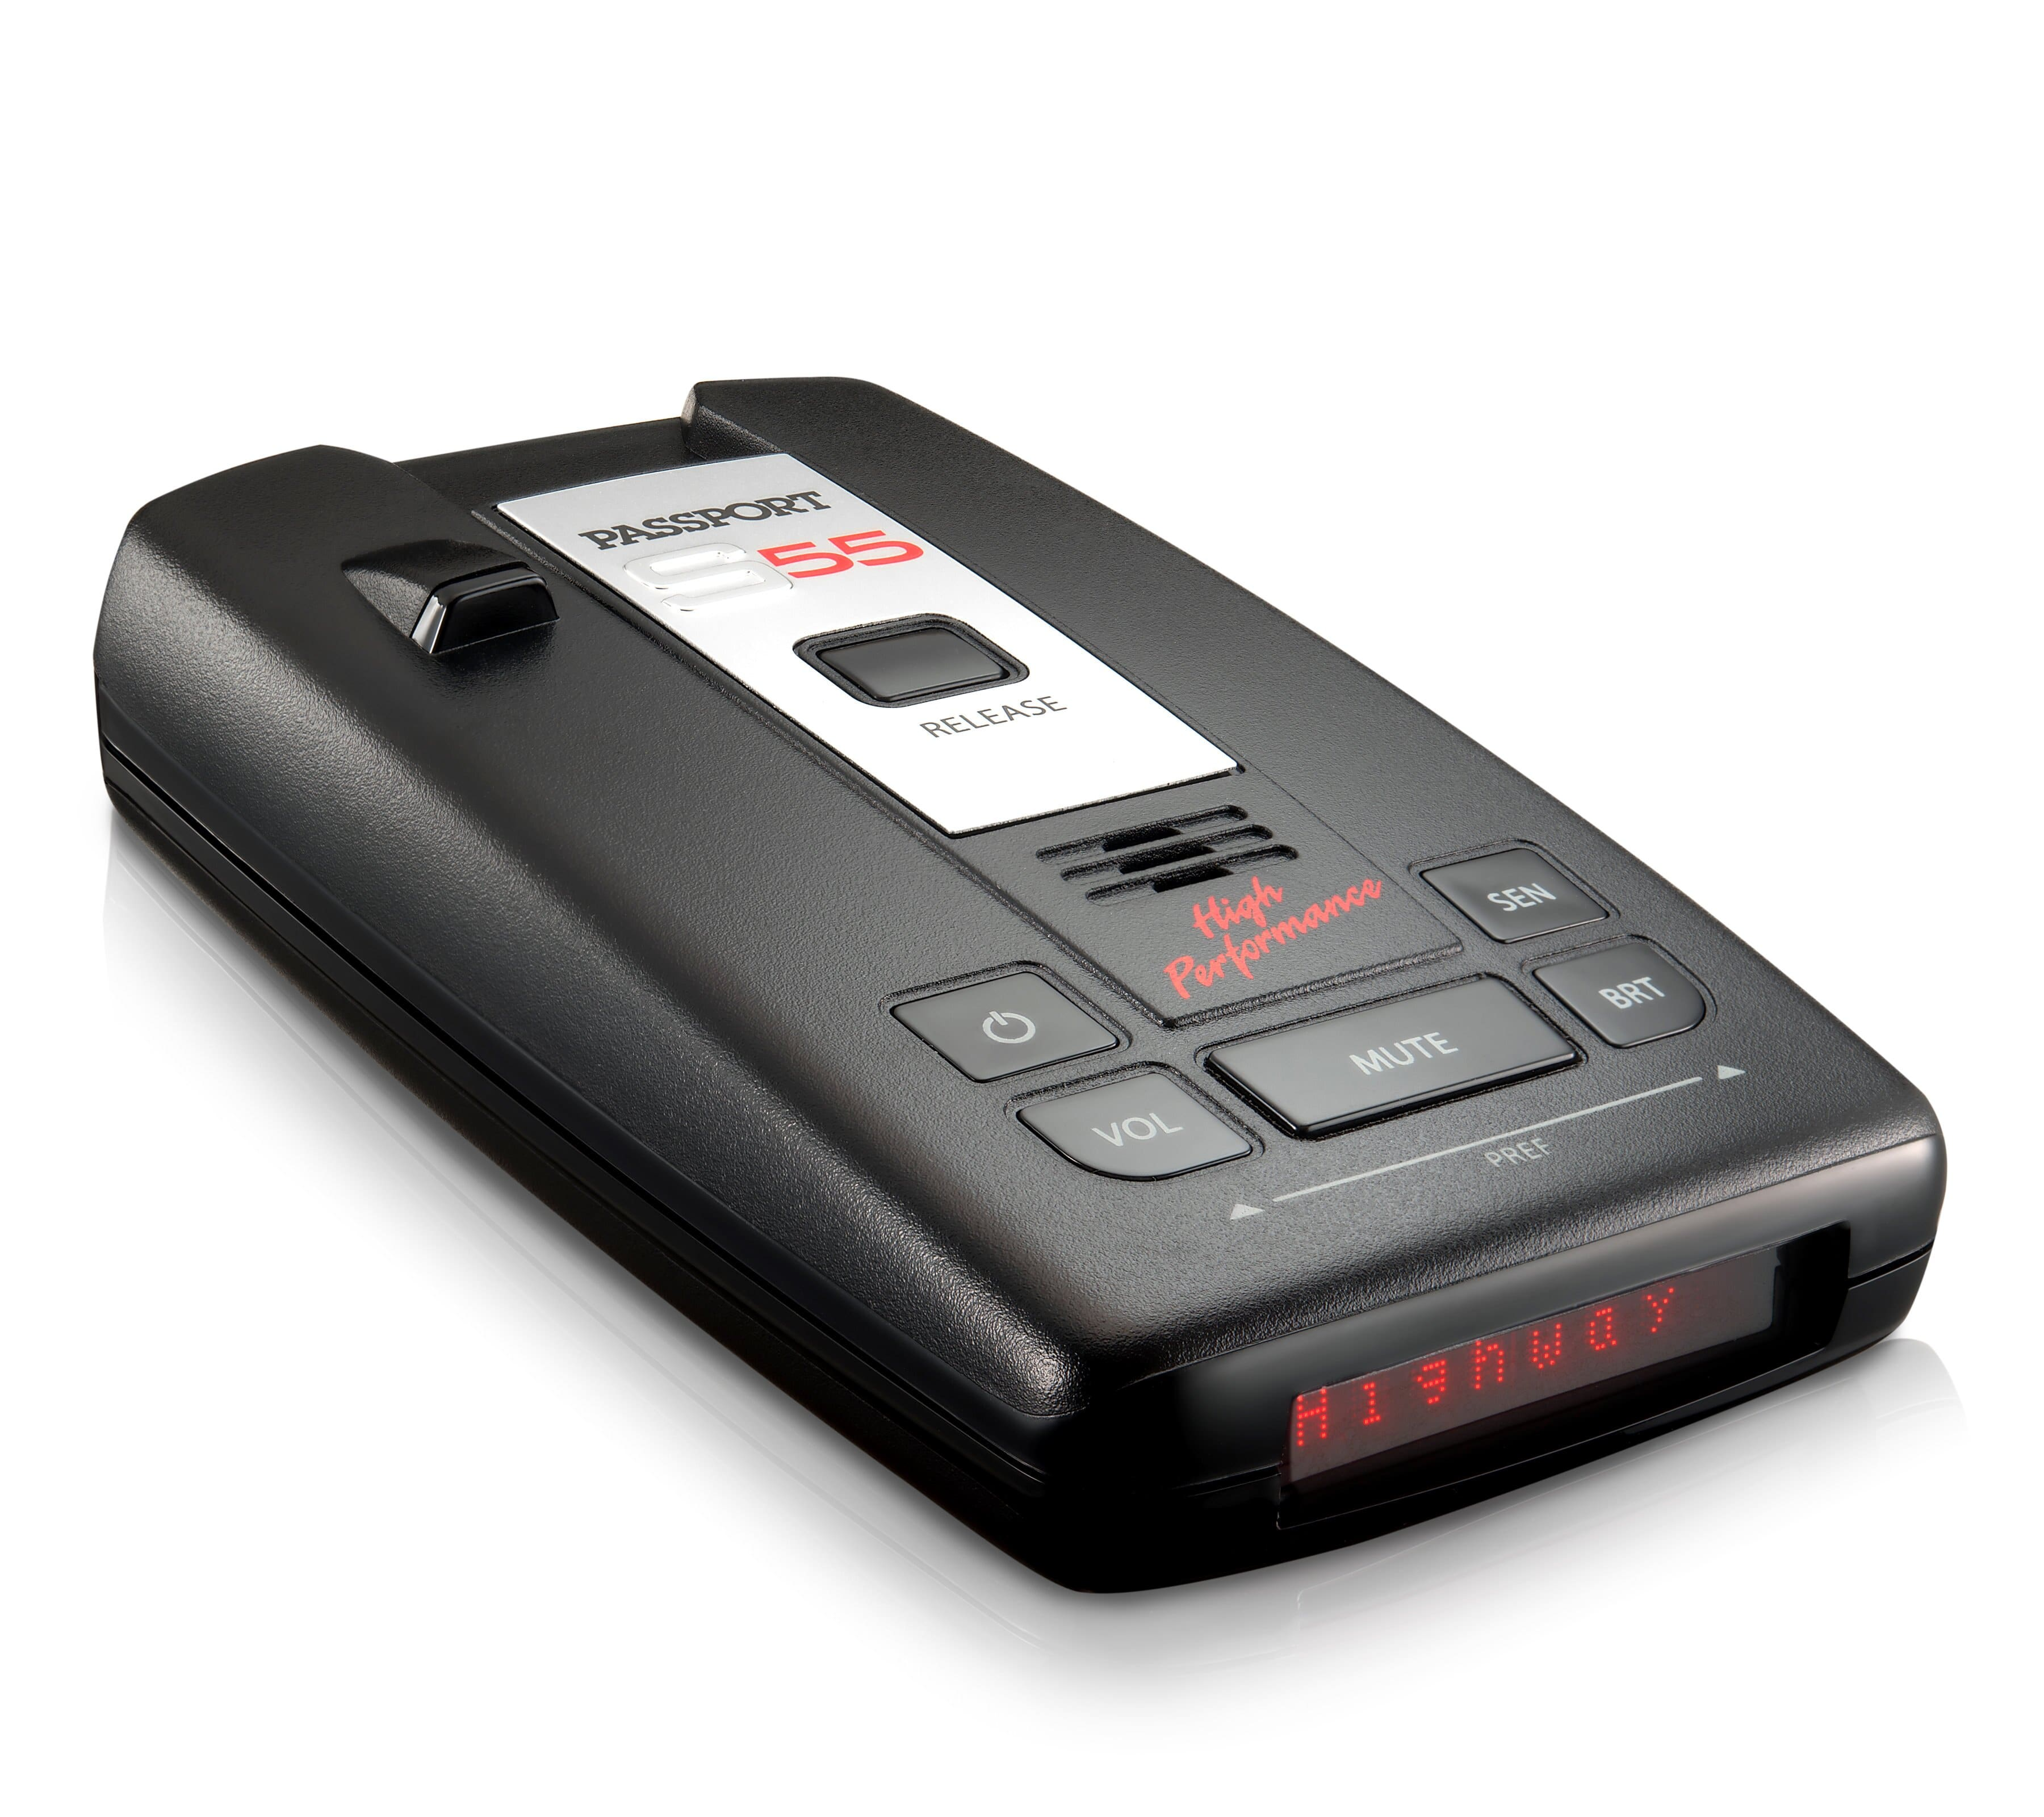 Escort Passport S55 Radar/Laser Detector $95 + free s/h